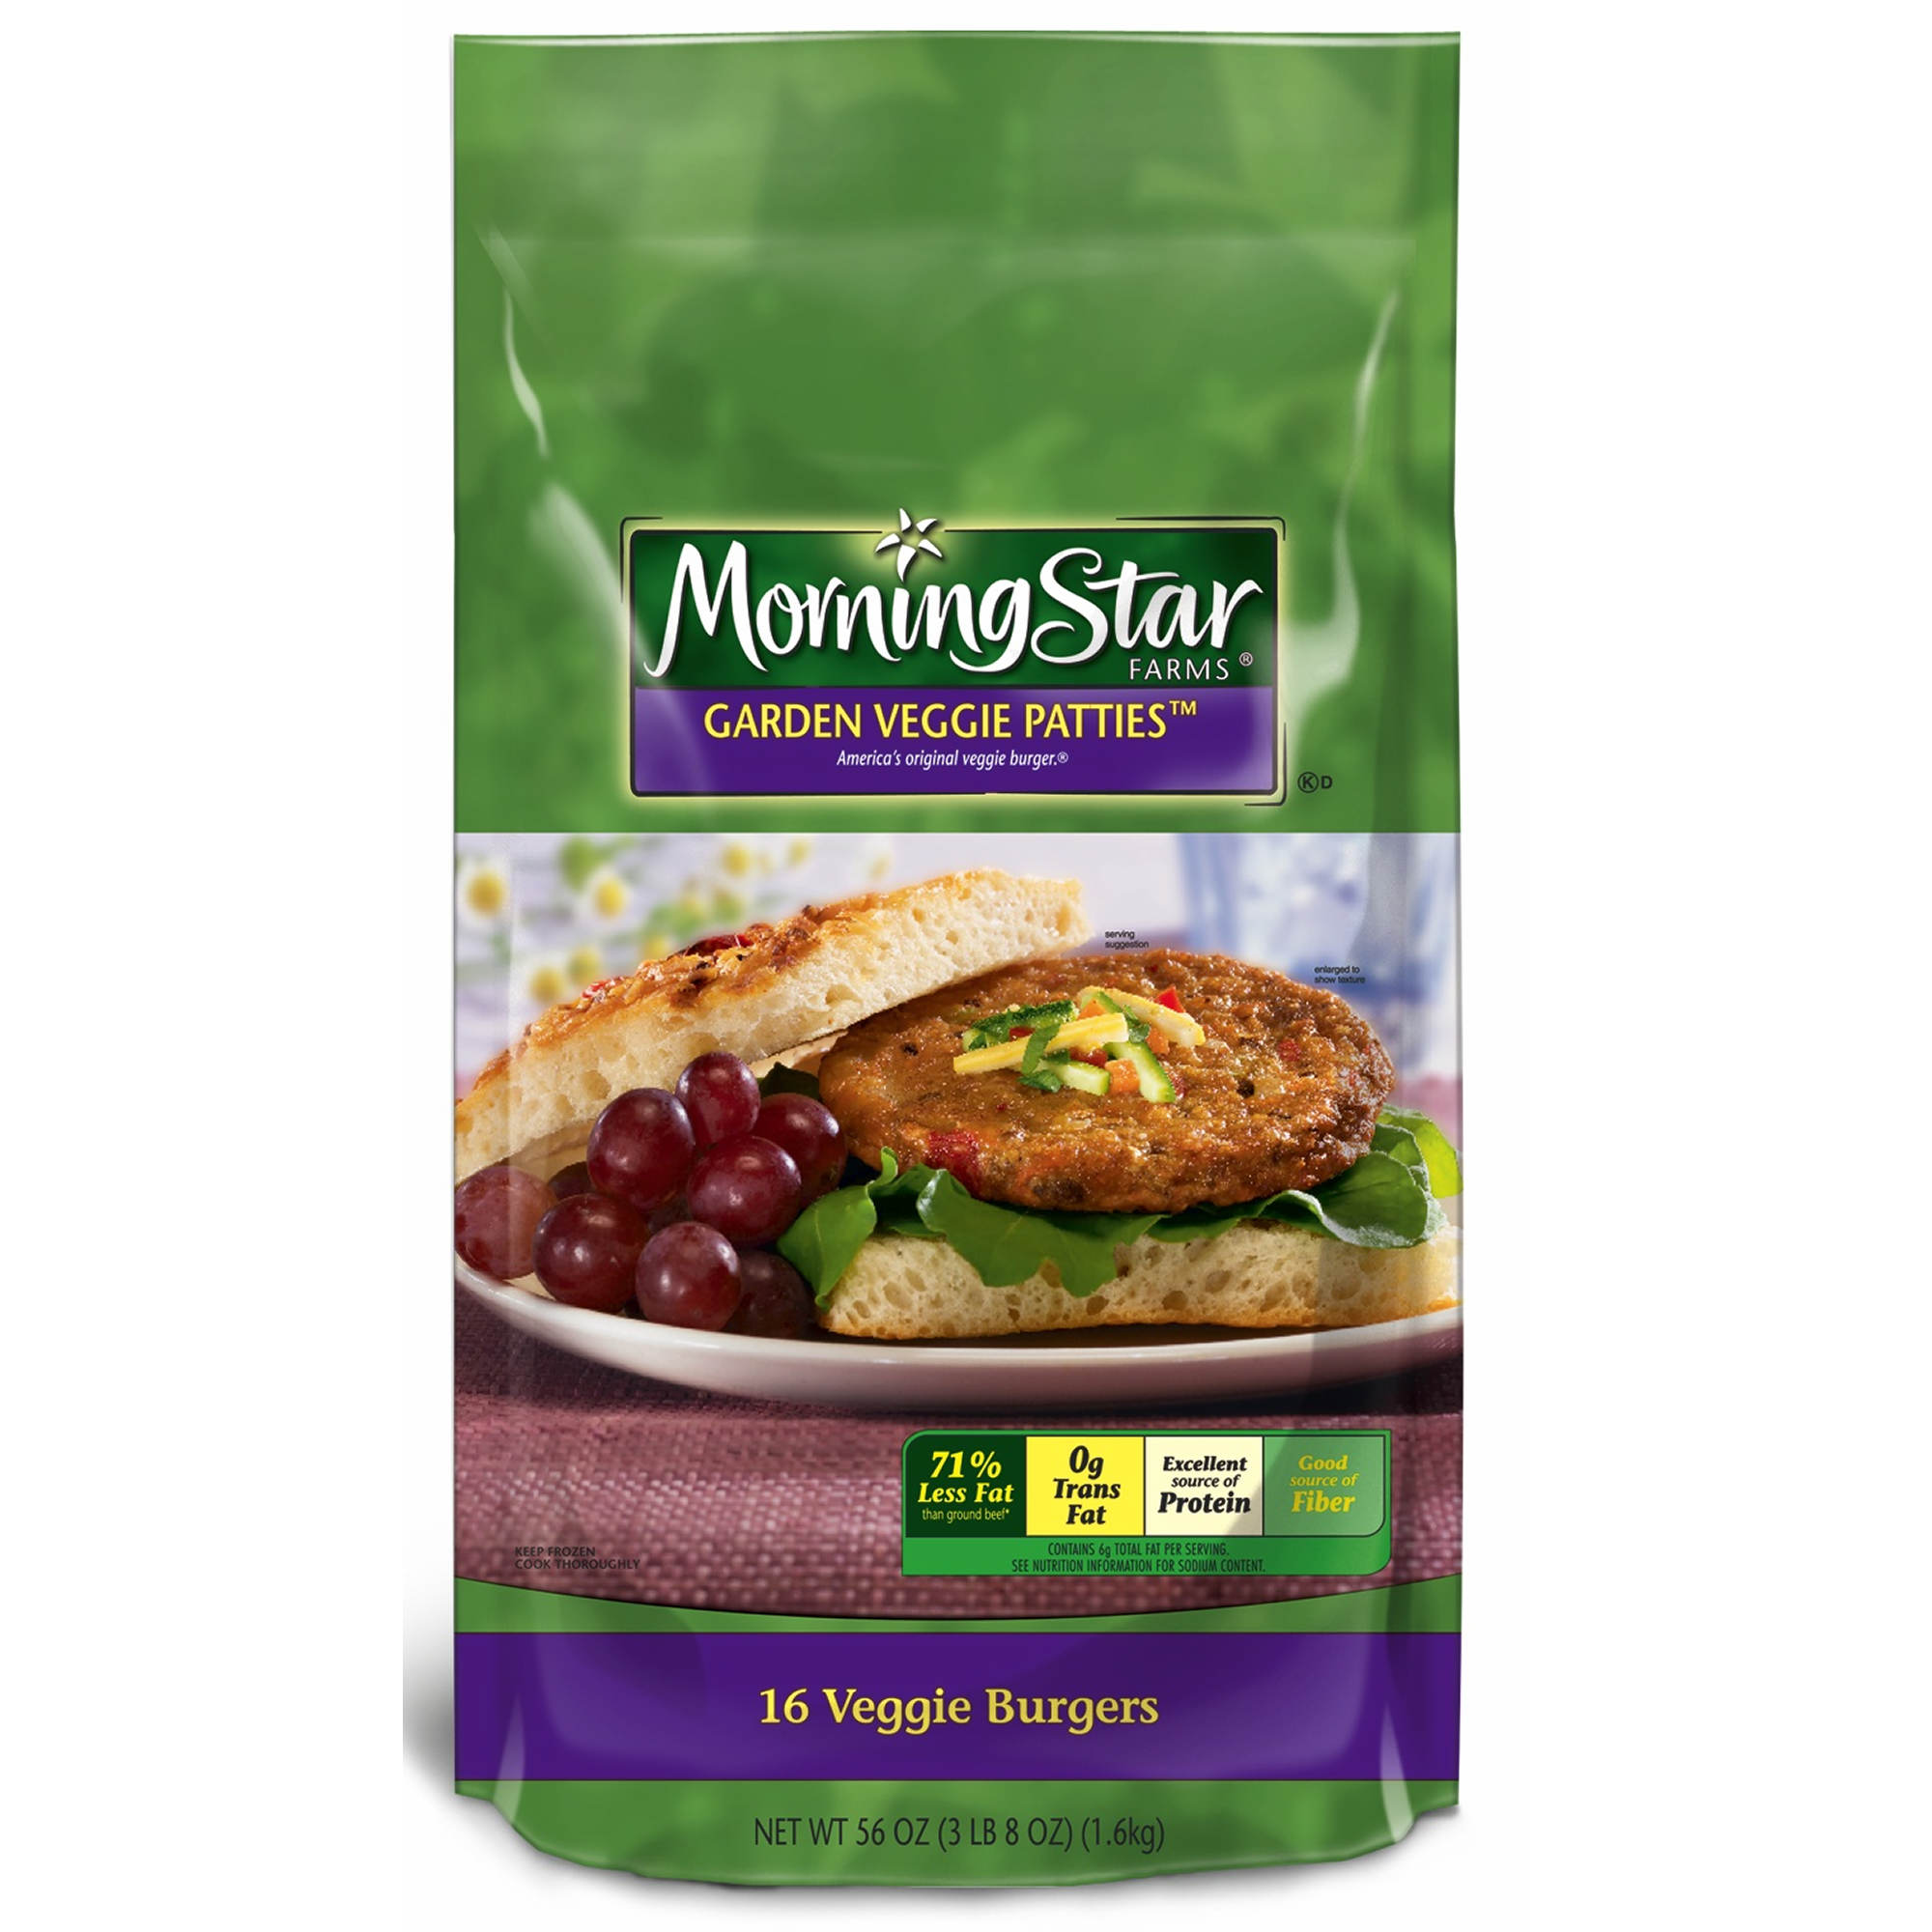 Morningstar Farms Garden Veggie Patties 16 Pk 3 5 Oz